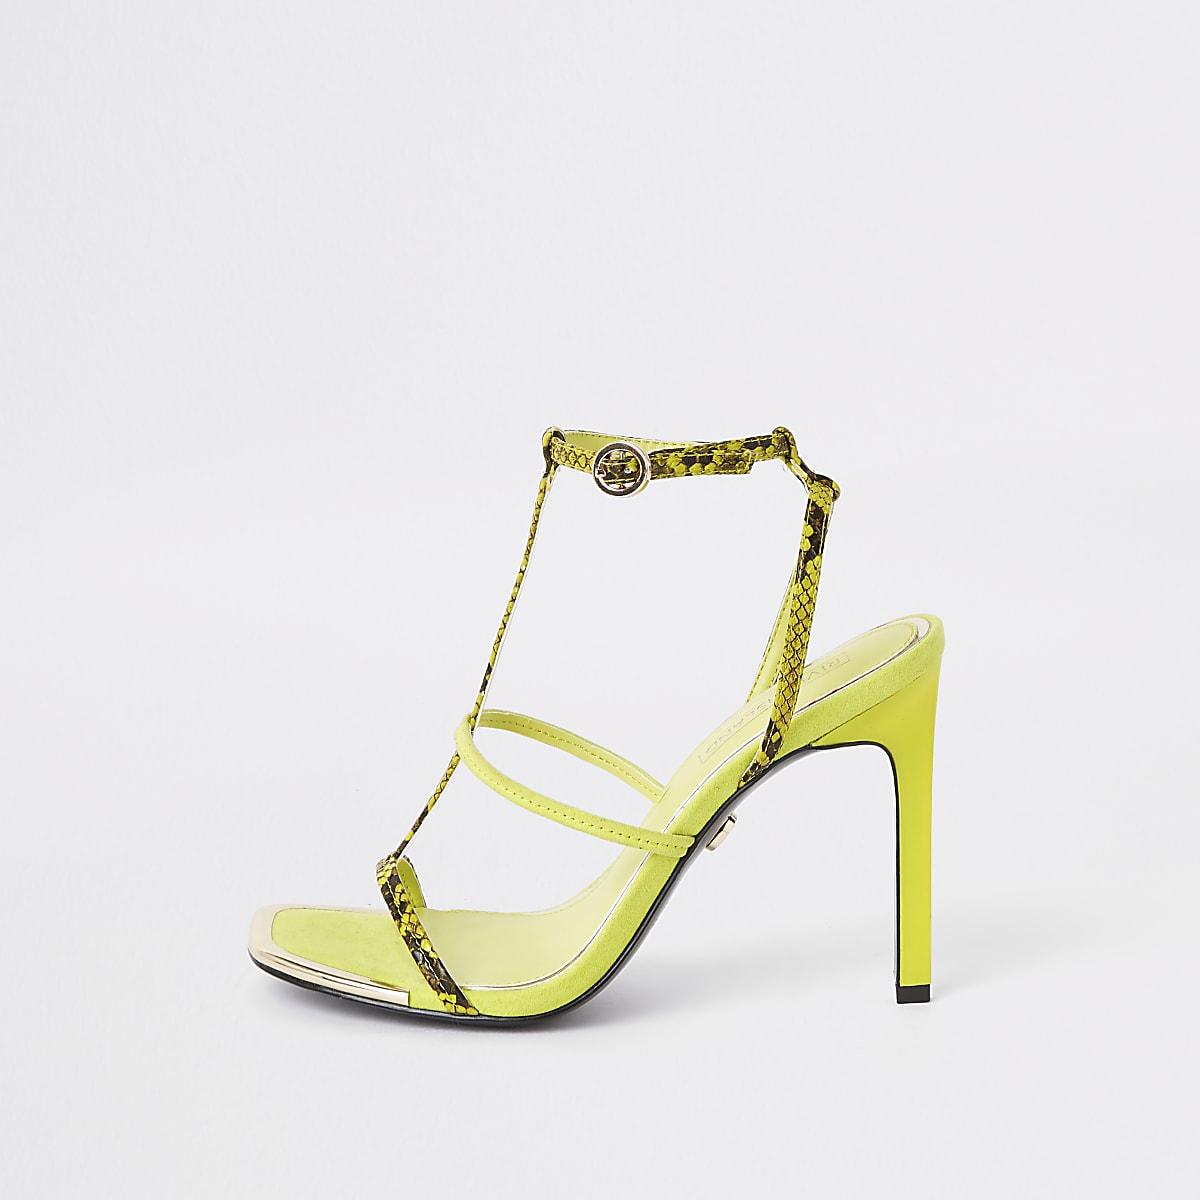 Neon yellow strappy heel sandals